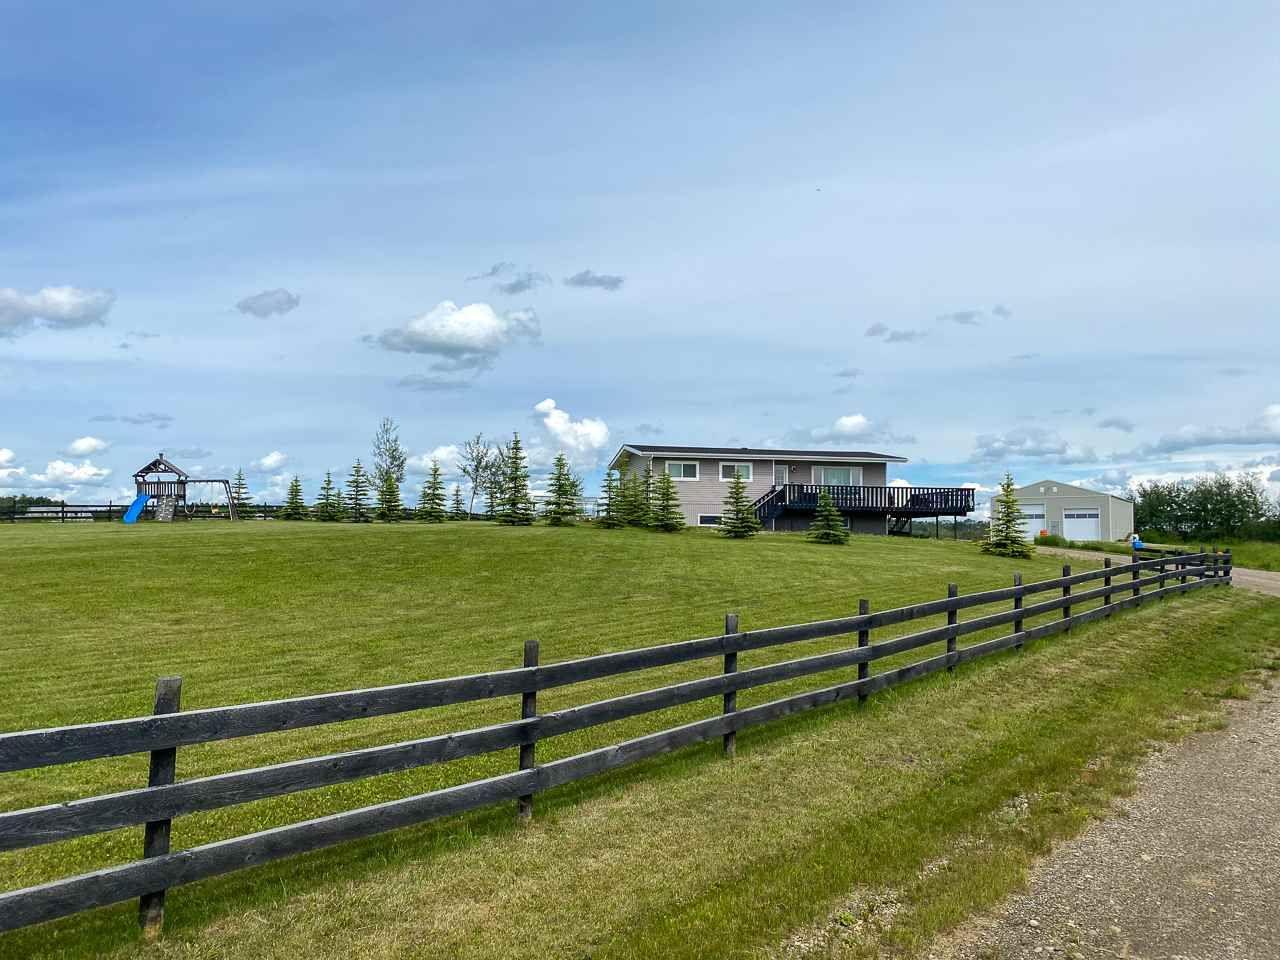 Main Photo: 7891 269 Road in Fort St. John: Fort St. John - Rural W 100th House for sale (Fort St. John (Zone 60))  : MLS®# R2472000